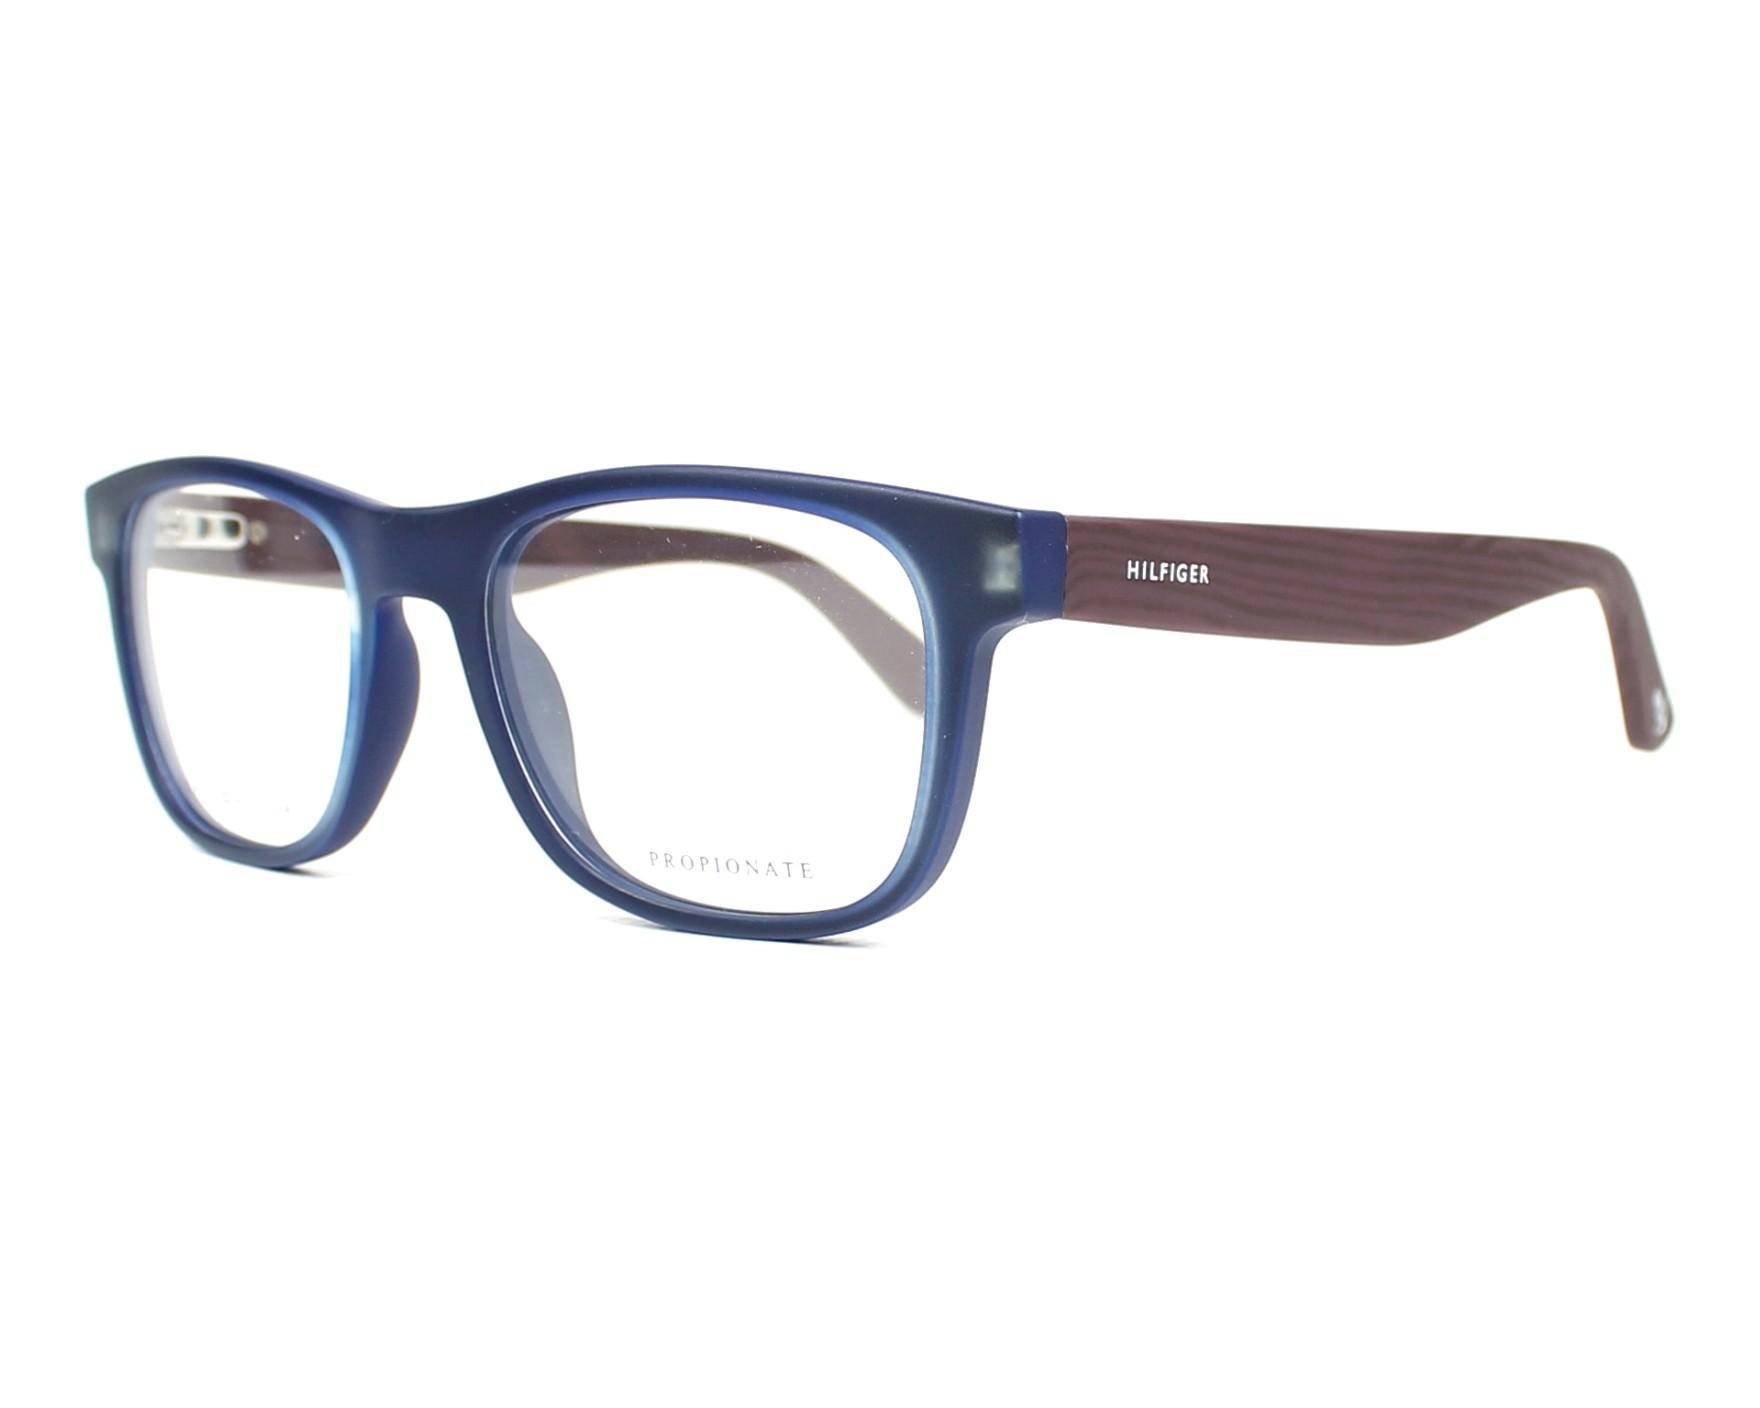 eyeglasses Tommy Hilfiger TH-1314 LWC - Blue Brown profile view